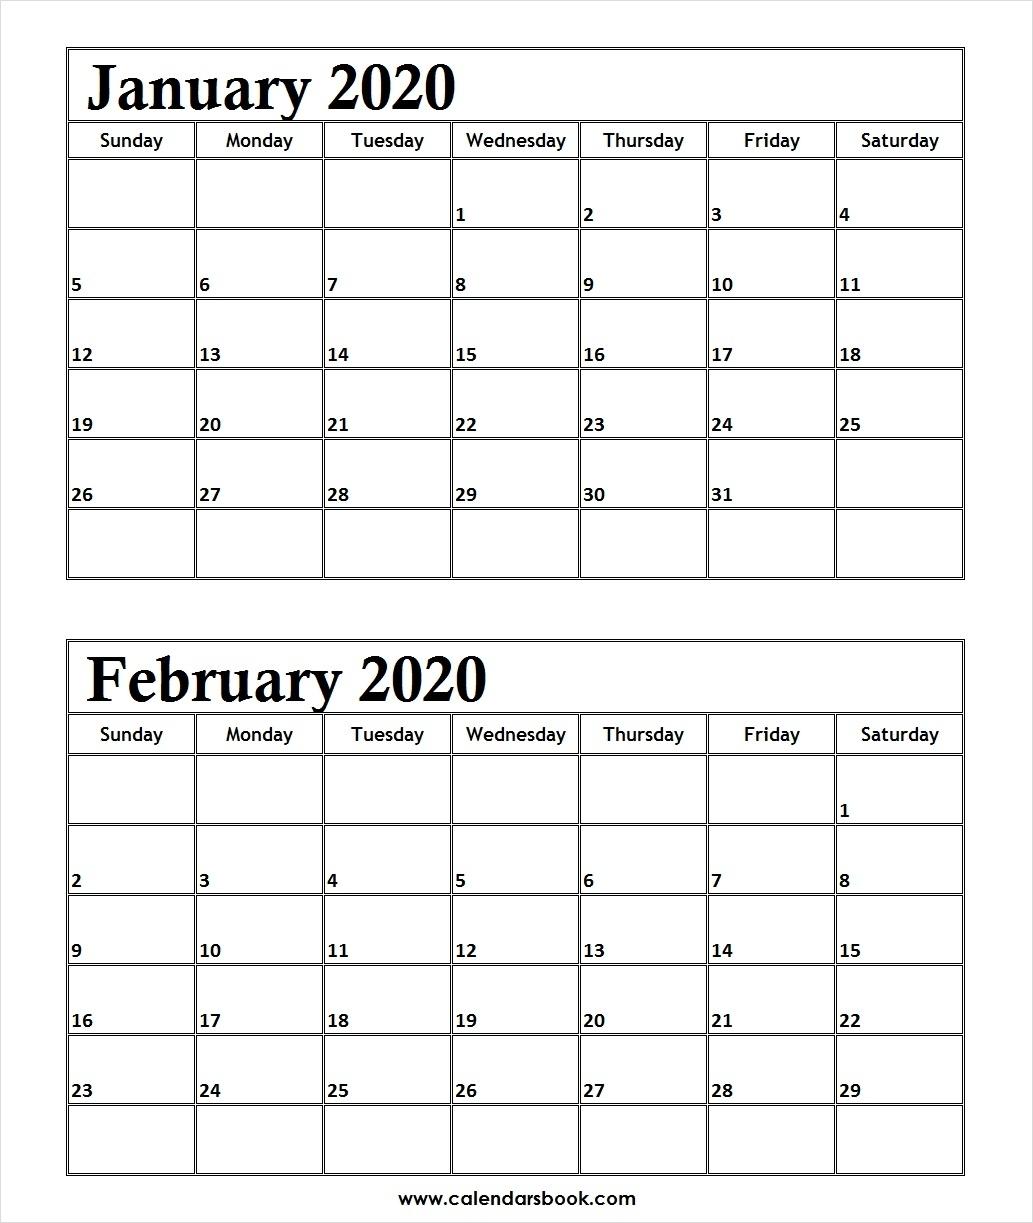 Print January February 2020 Calendar Template | 2 Month Calendar